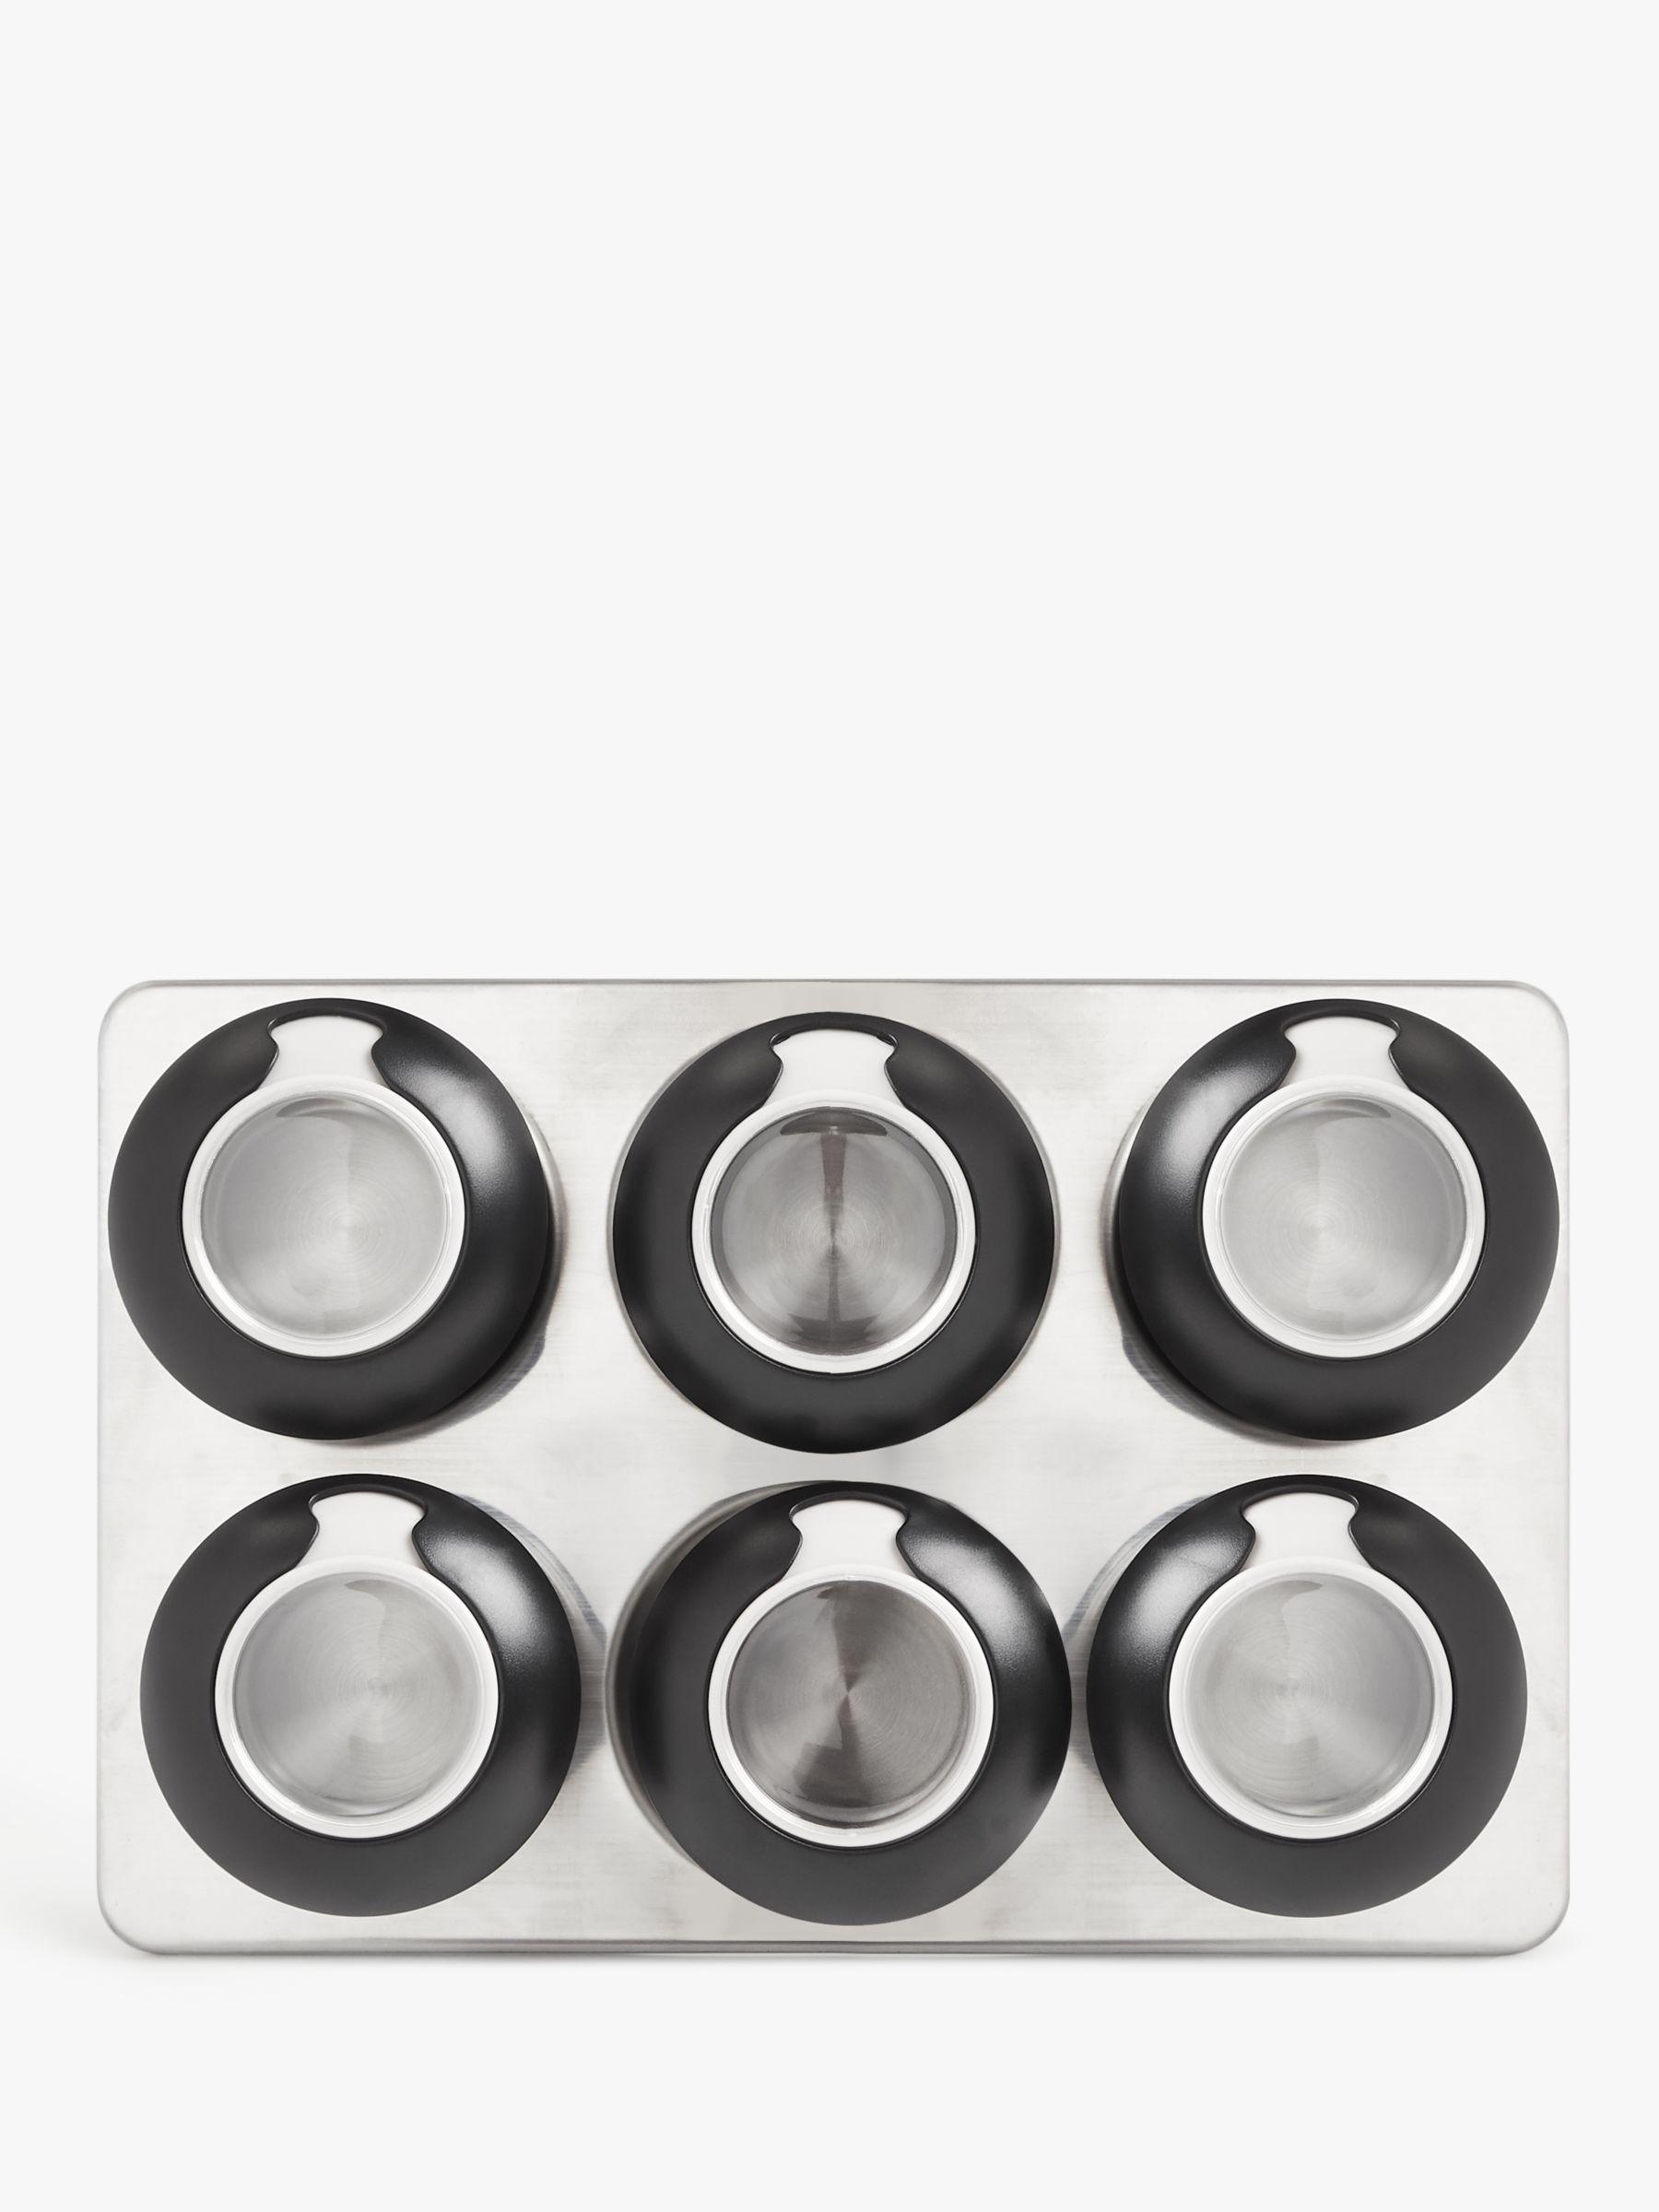 John Lewis & Partners Professional Stainless Steel Freestanding Magnetic Spice Rack, 6 Jars